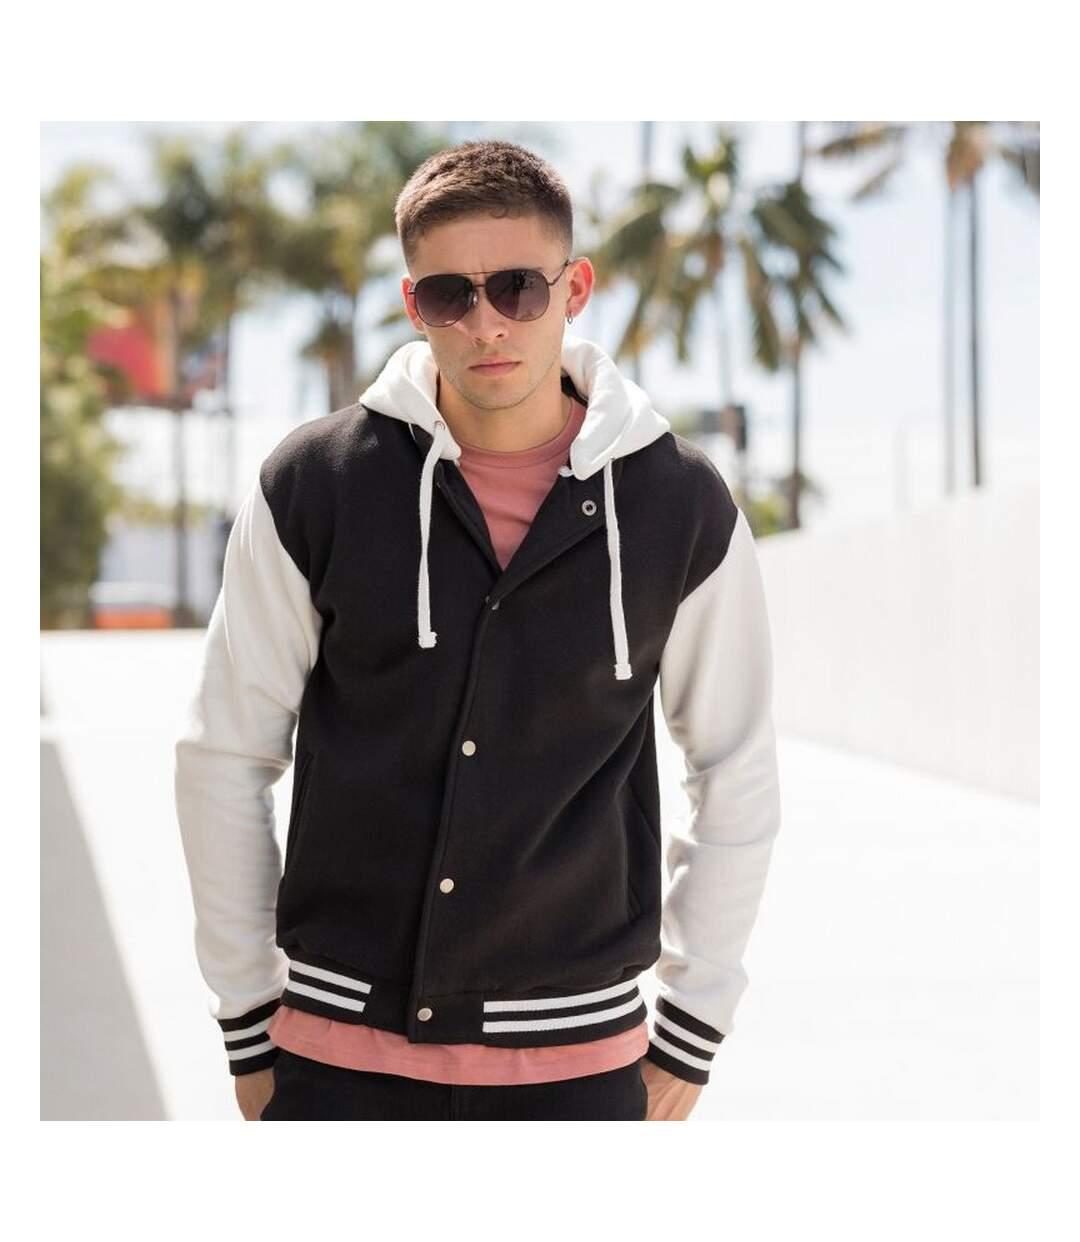 Skinni Fit Mens Heavy Weight Baseball Jacket With Detachable Hood (Black/Off White) - UTRW1395